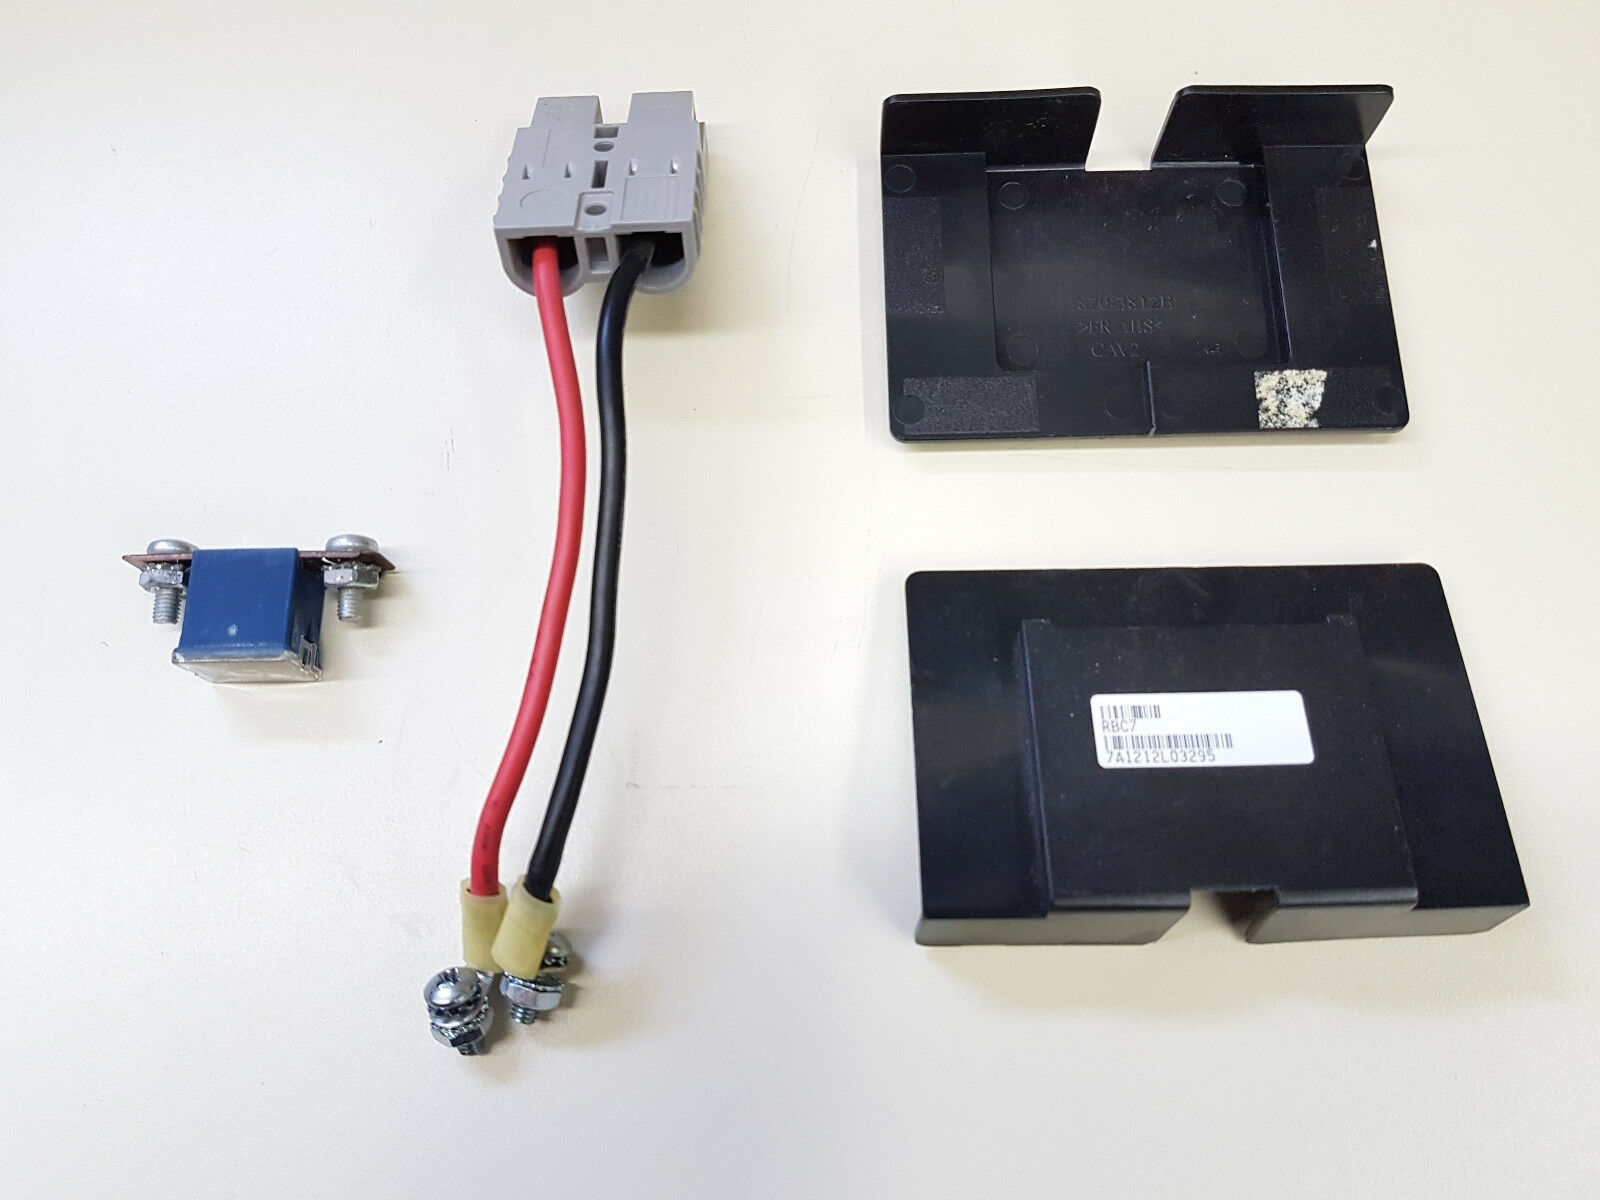 864.00 грн - APC SmartUPS RBC7/RBC11 Battery Pack connector Wiring harness  + Fuse + Covers | UPS-аккумуляторы и компоненты с аукциона eBay |  eBuyShop.com.ua